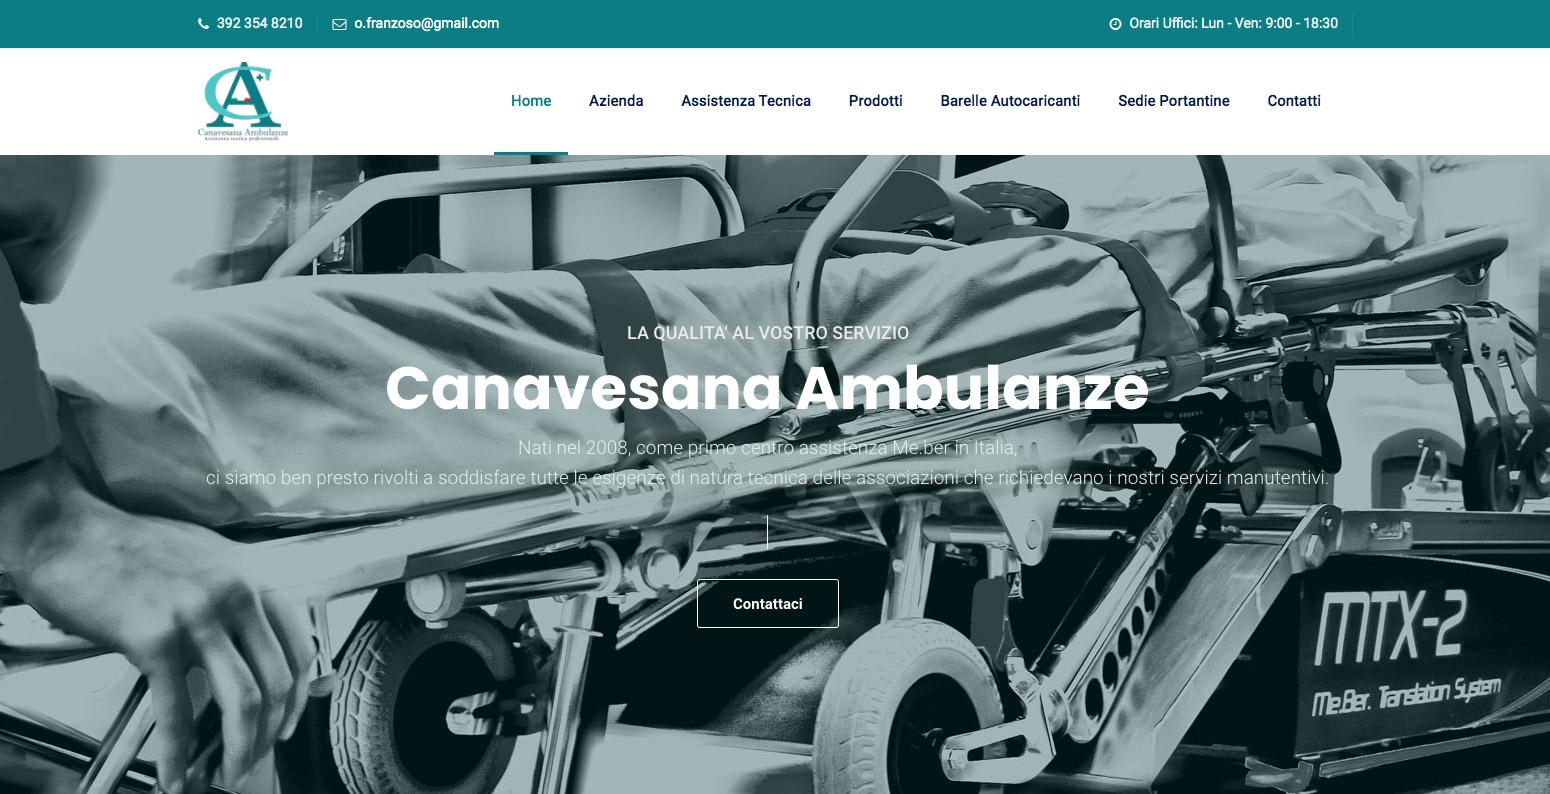 Siti Web Torino per settore emergenza medica